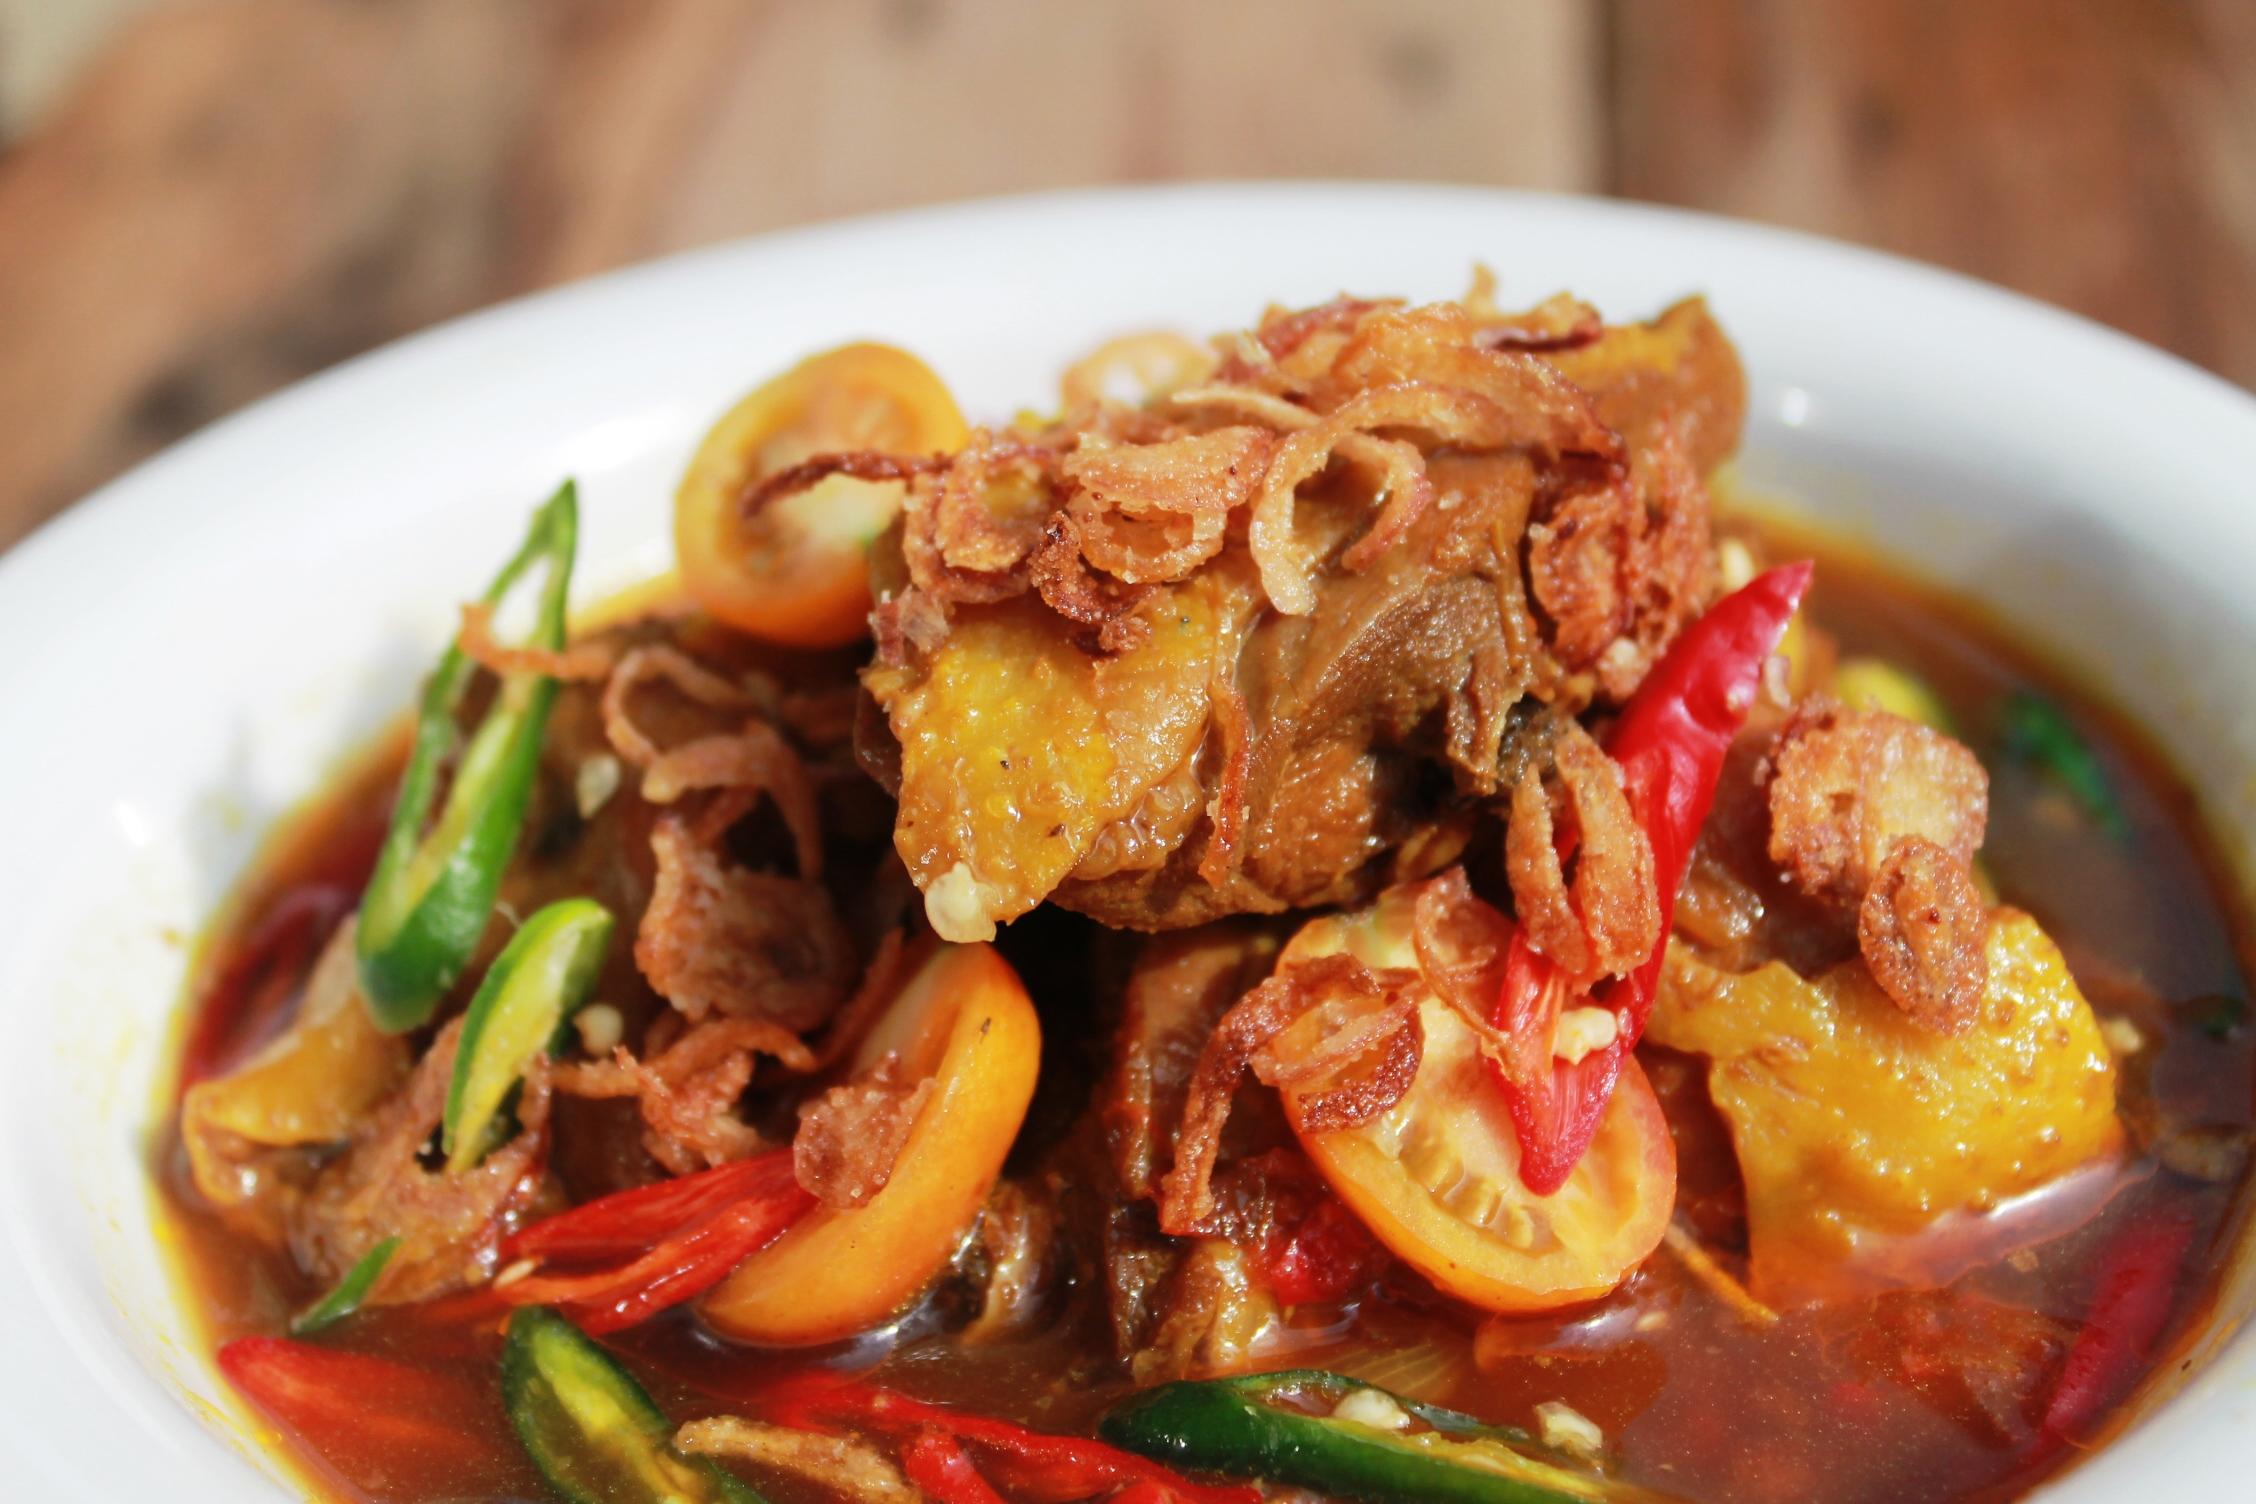 About Resep Masakan Ayam Download Lengkap